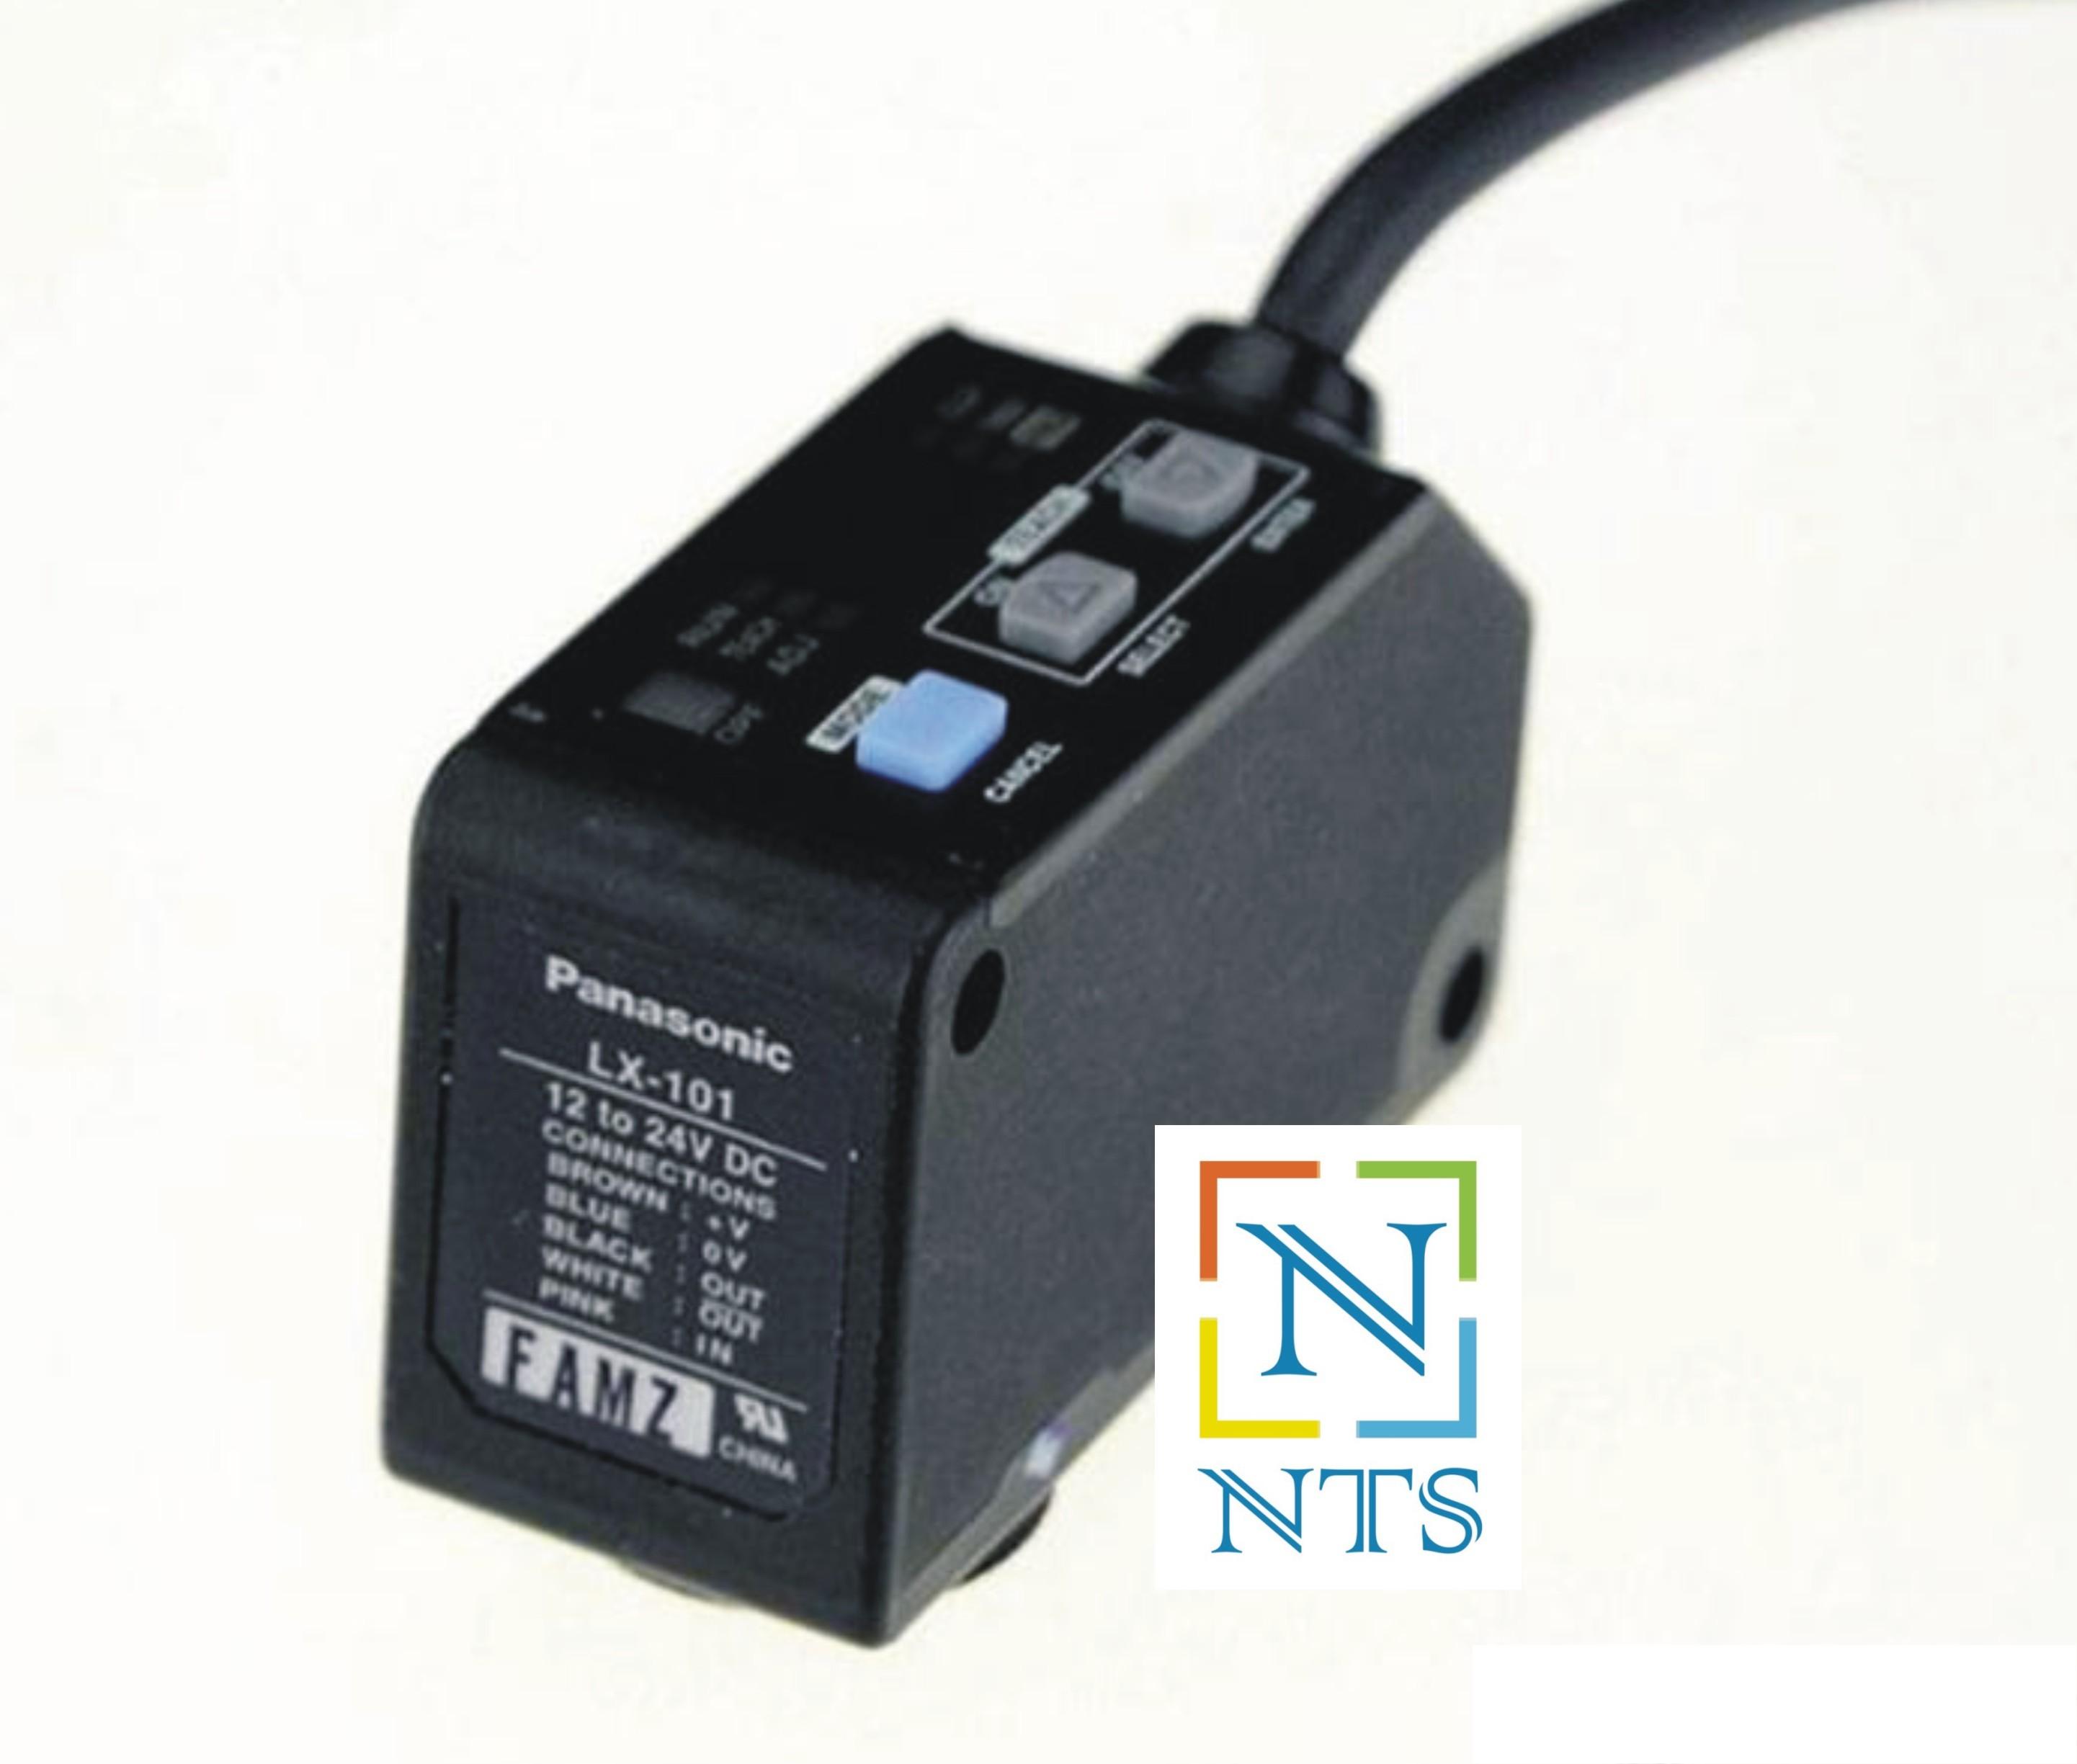 Panasonic LX-101 Color Mark Sensor